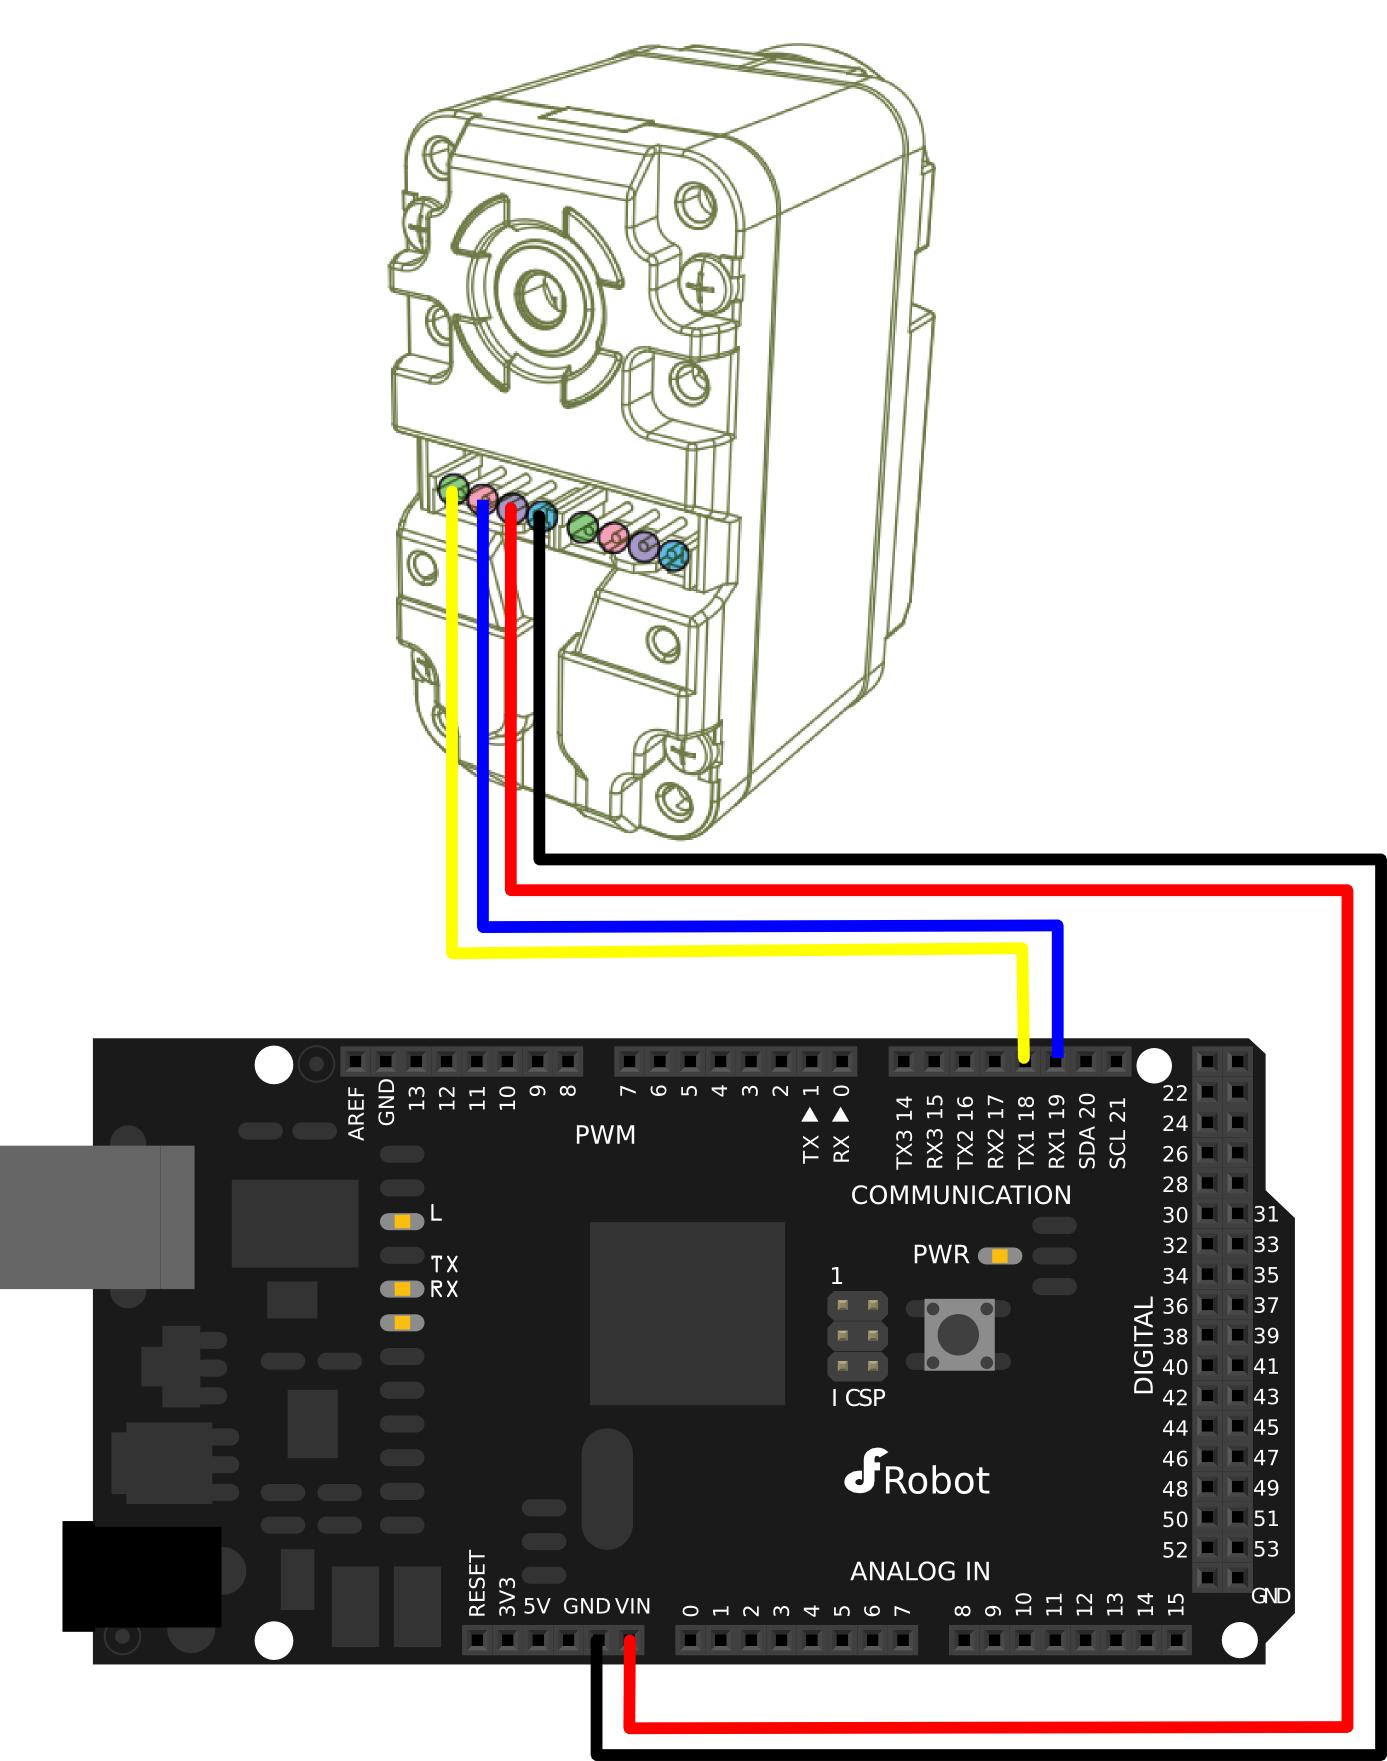 SER0032 DRS - 0101 HerkuleX Smart Servo Connection Diagram